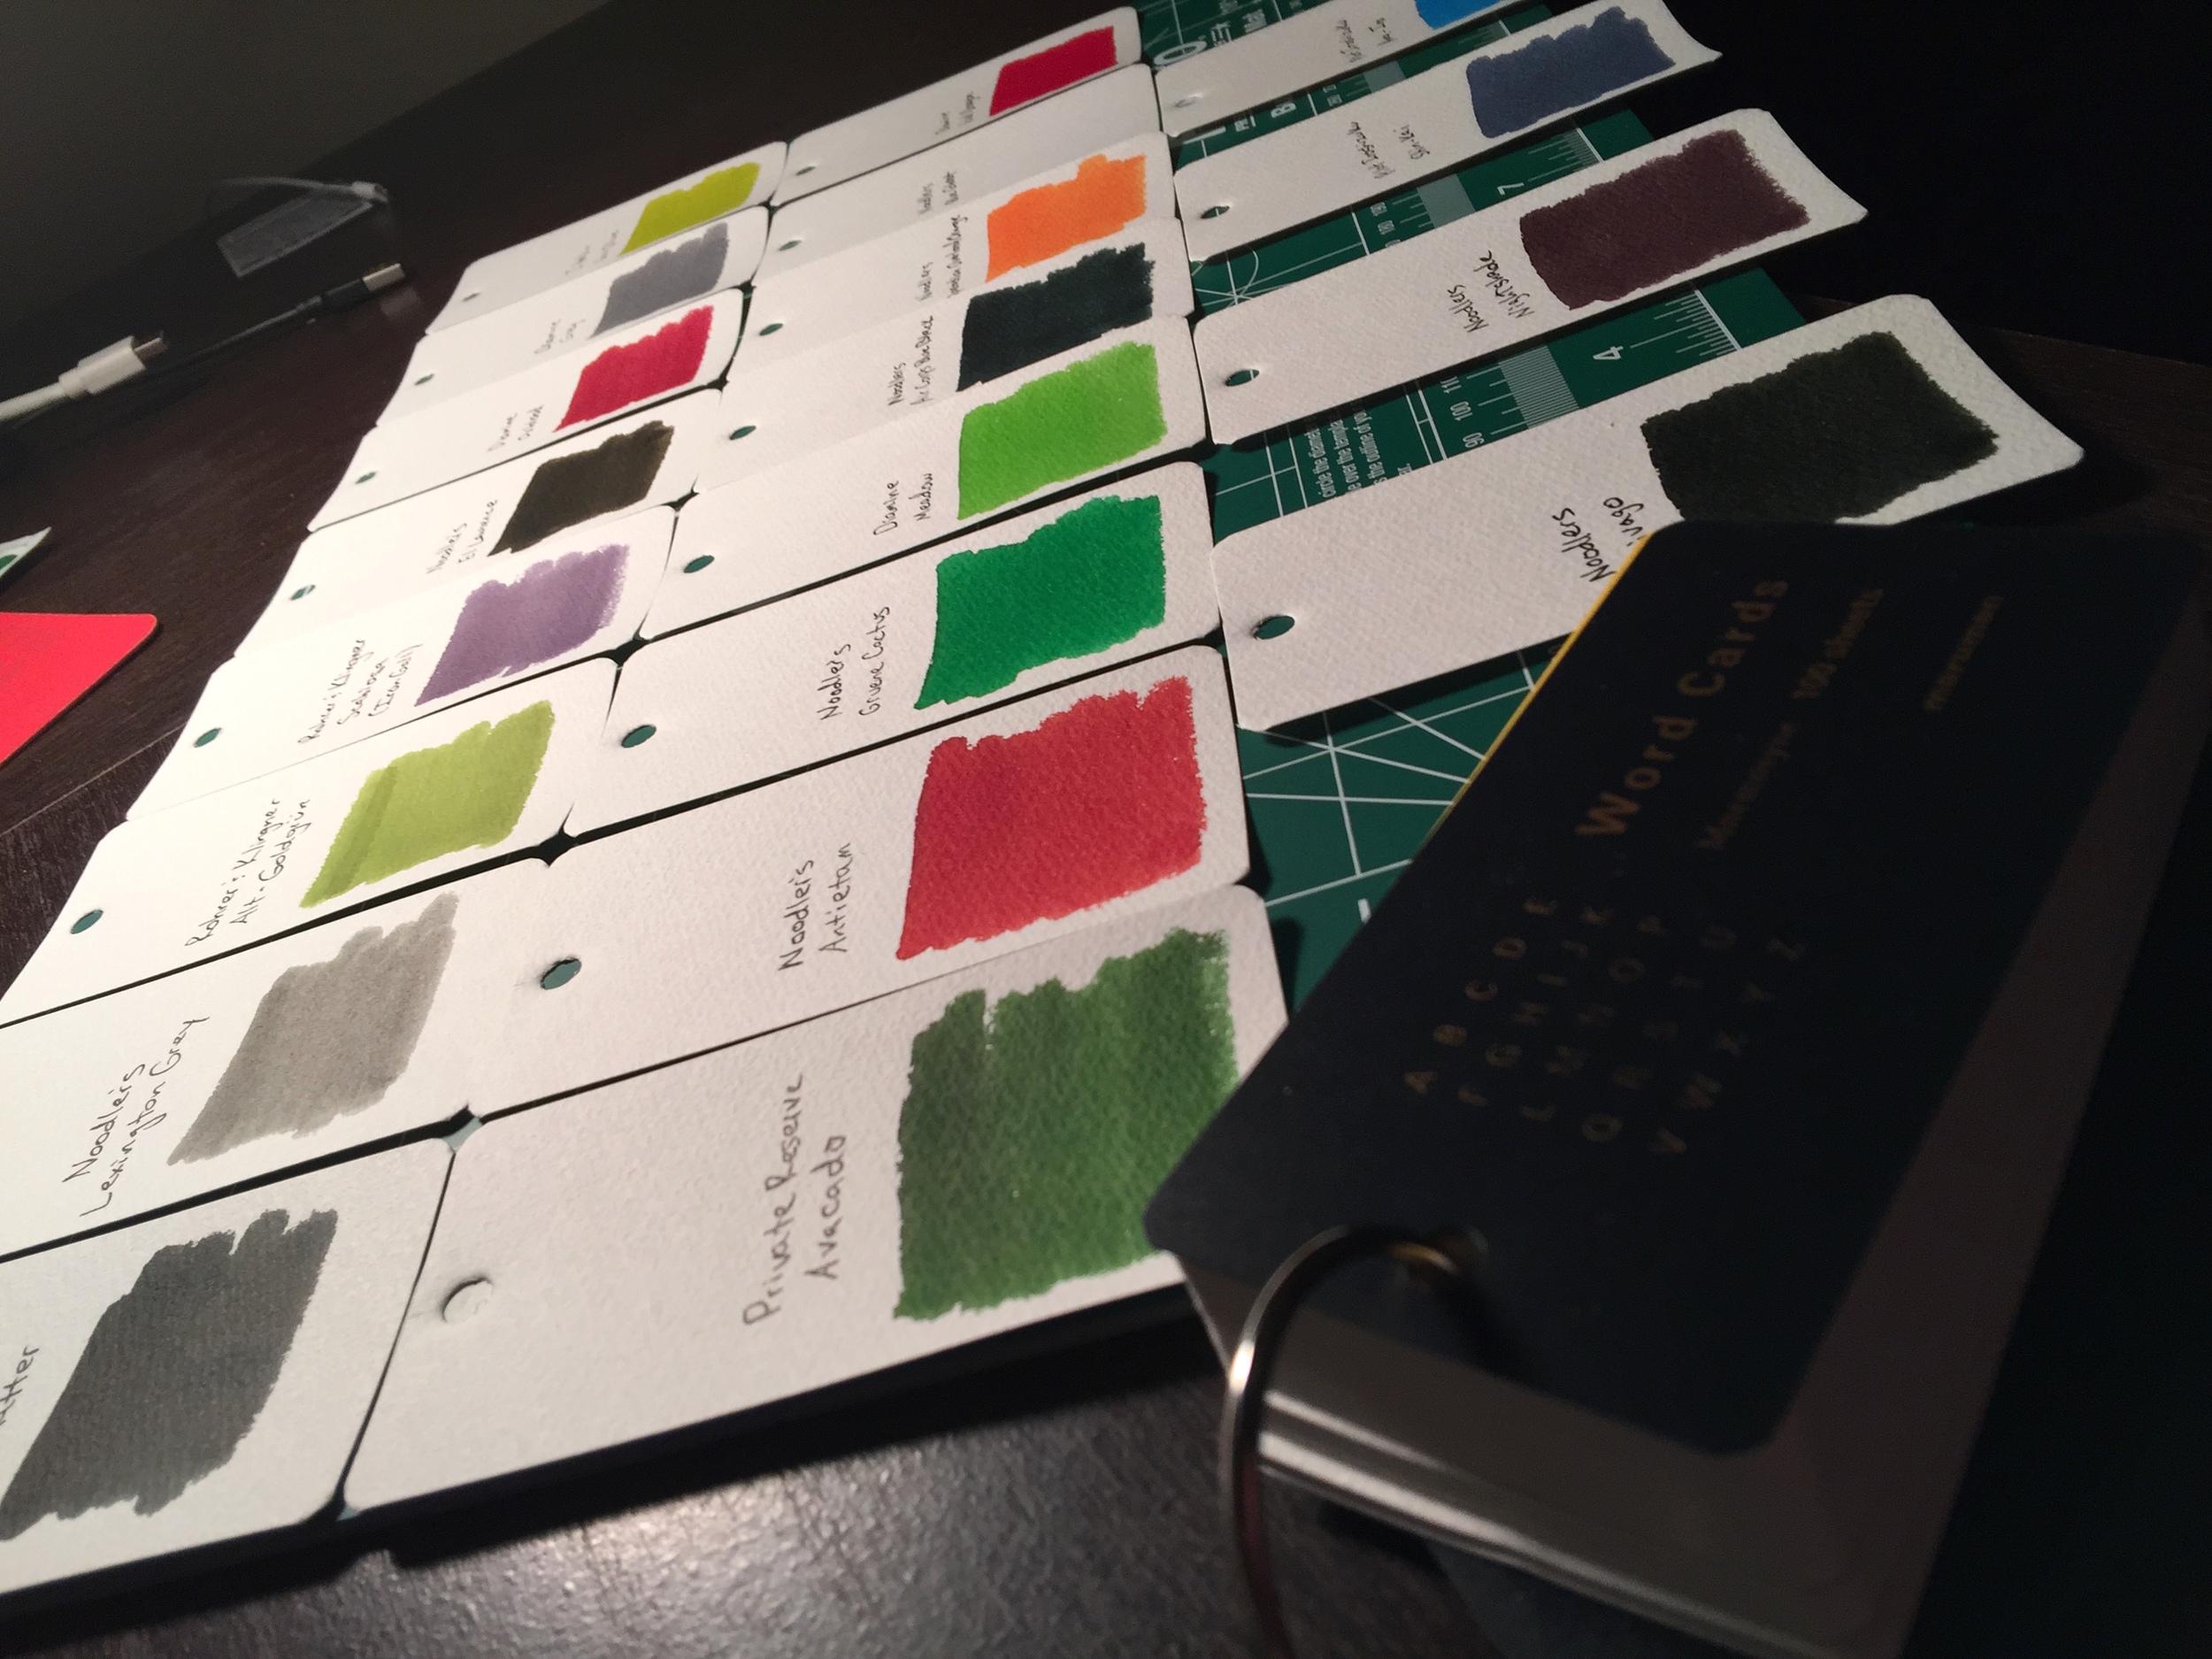 maruman-word-cards-side